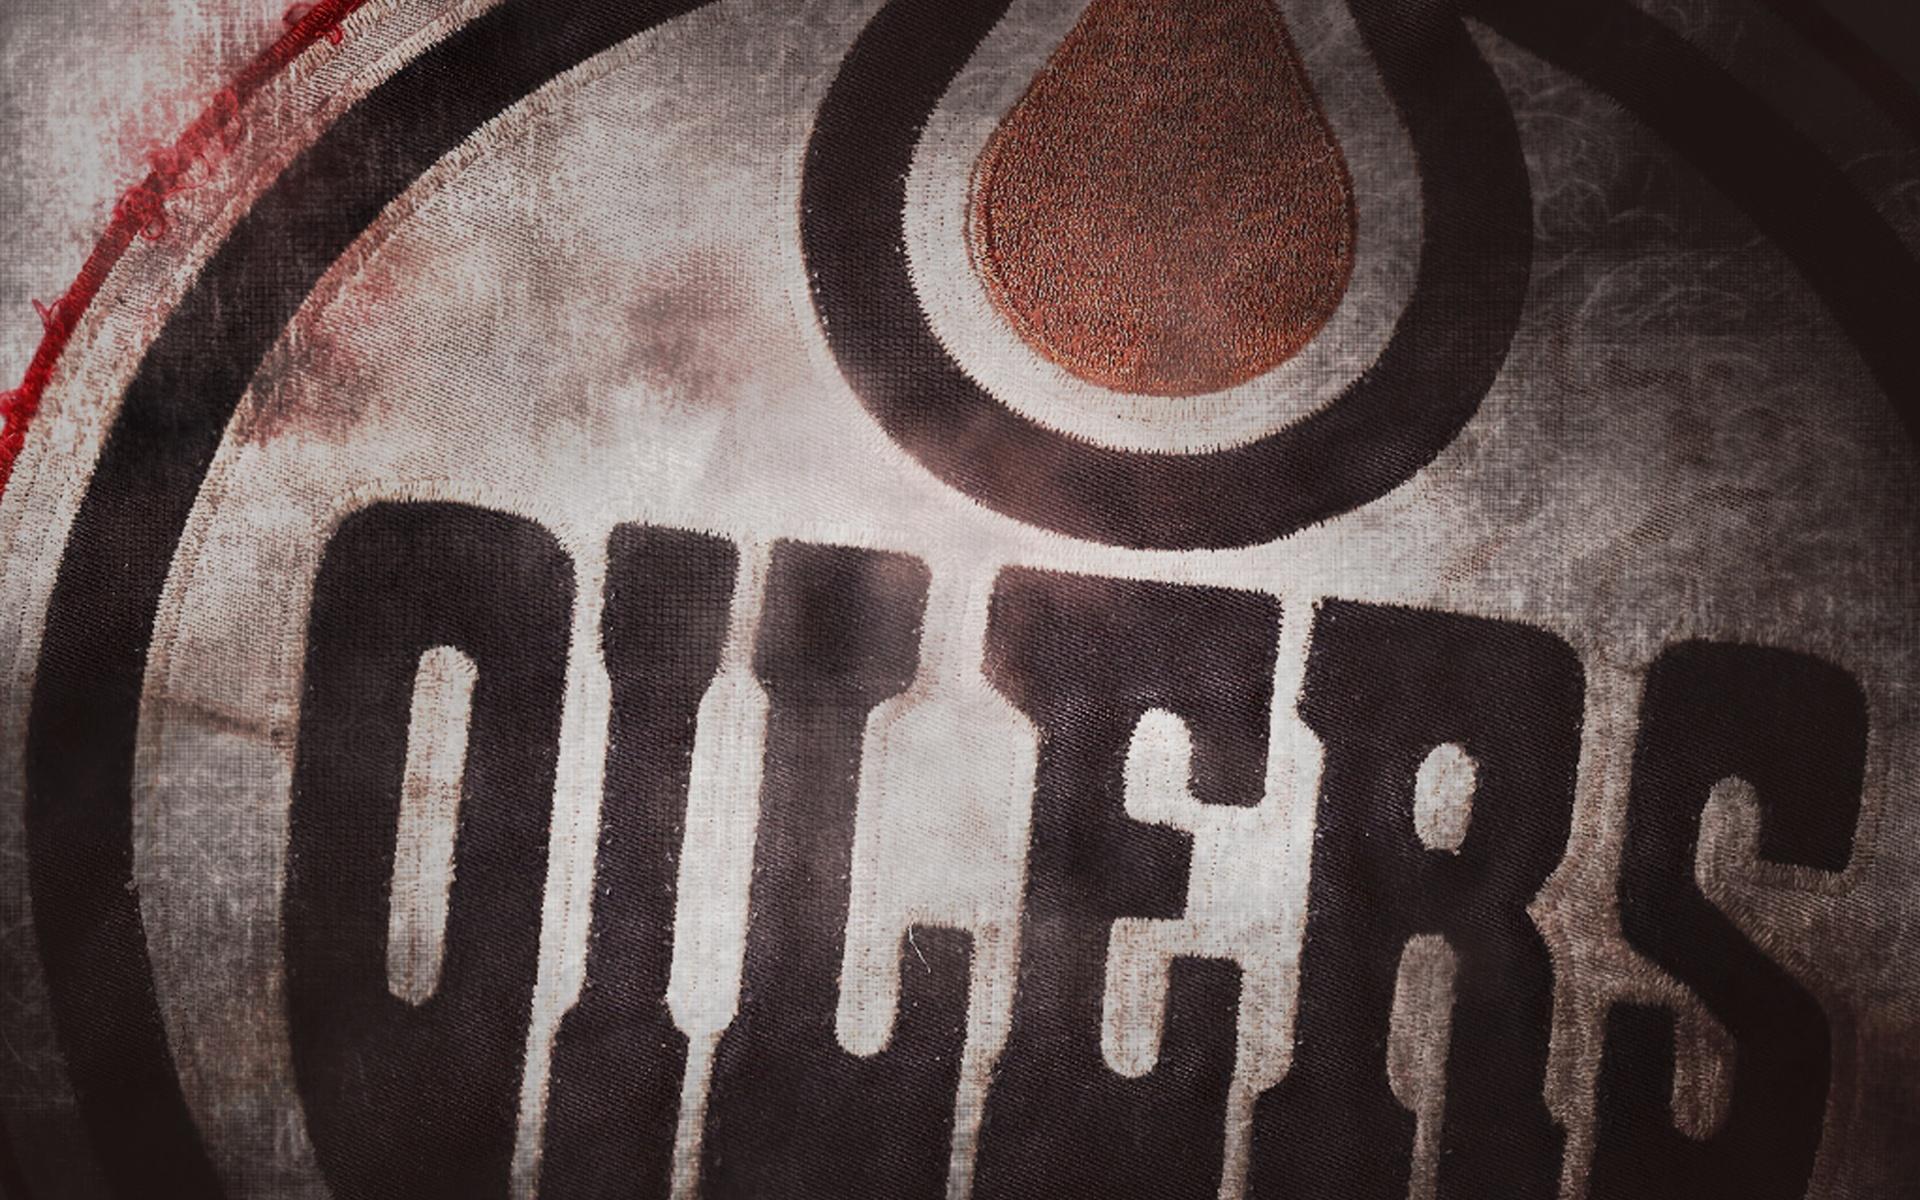 Good Wallpaper Logo Edmonton Oilers - cdfd8d2236eee69b75ced18b77229cca  Photograph_219419.jpg